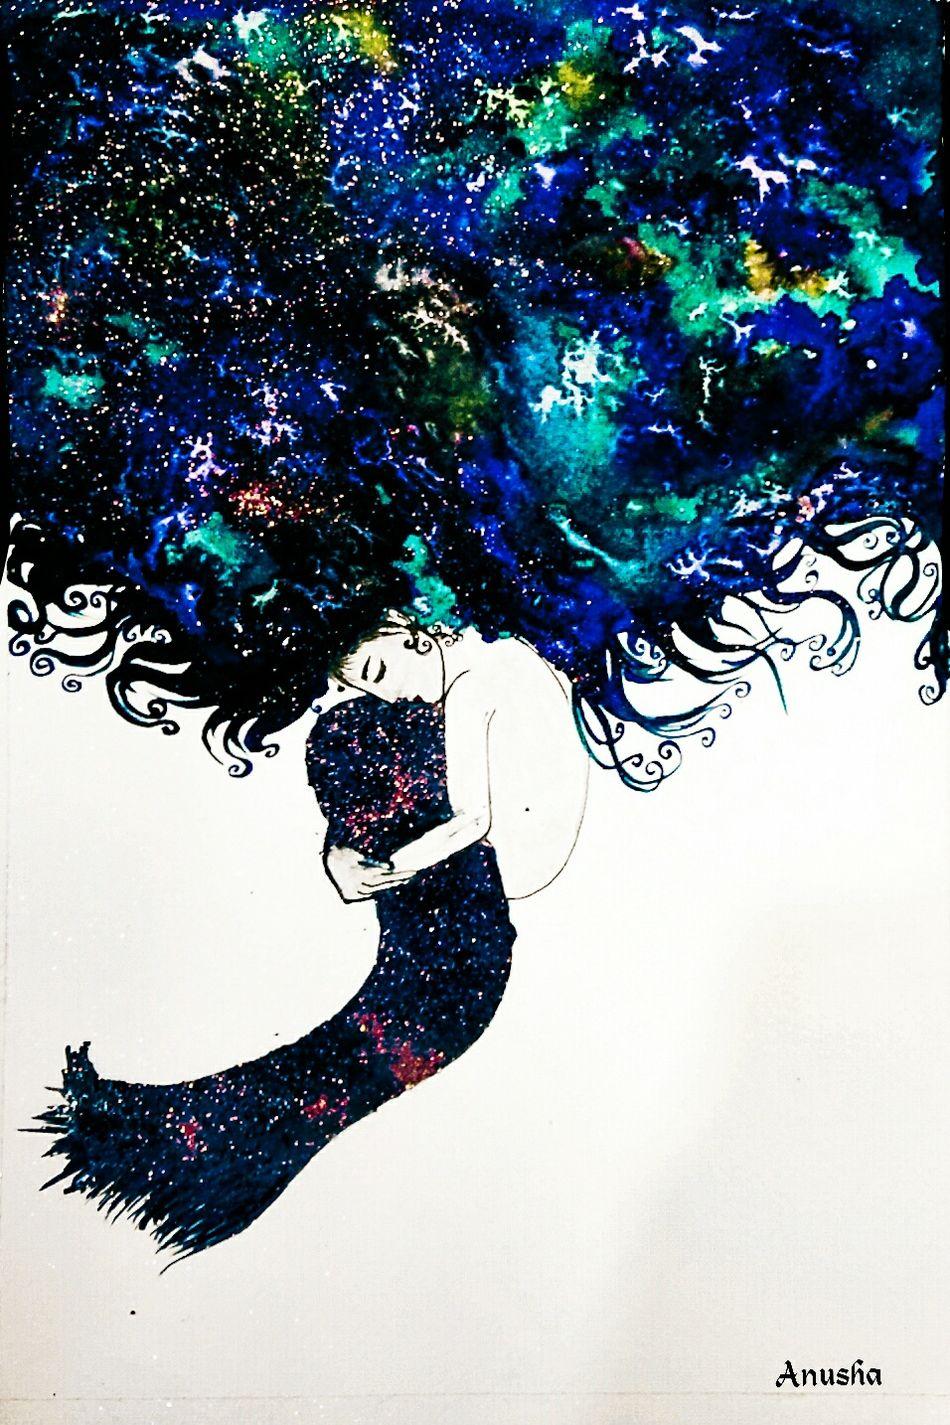 Watercolours Waterblog Creativity Creative Painting Watercolor Watercolorpainting Art Artworks Illustration Blue Colors